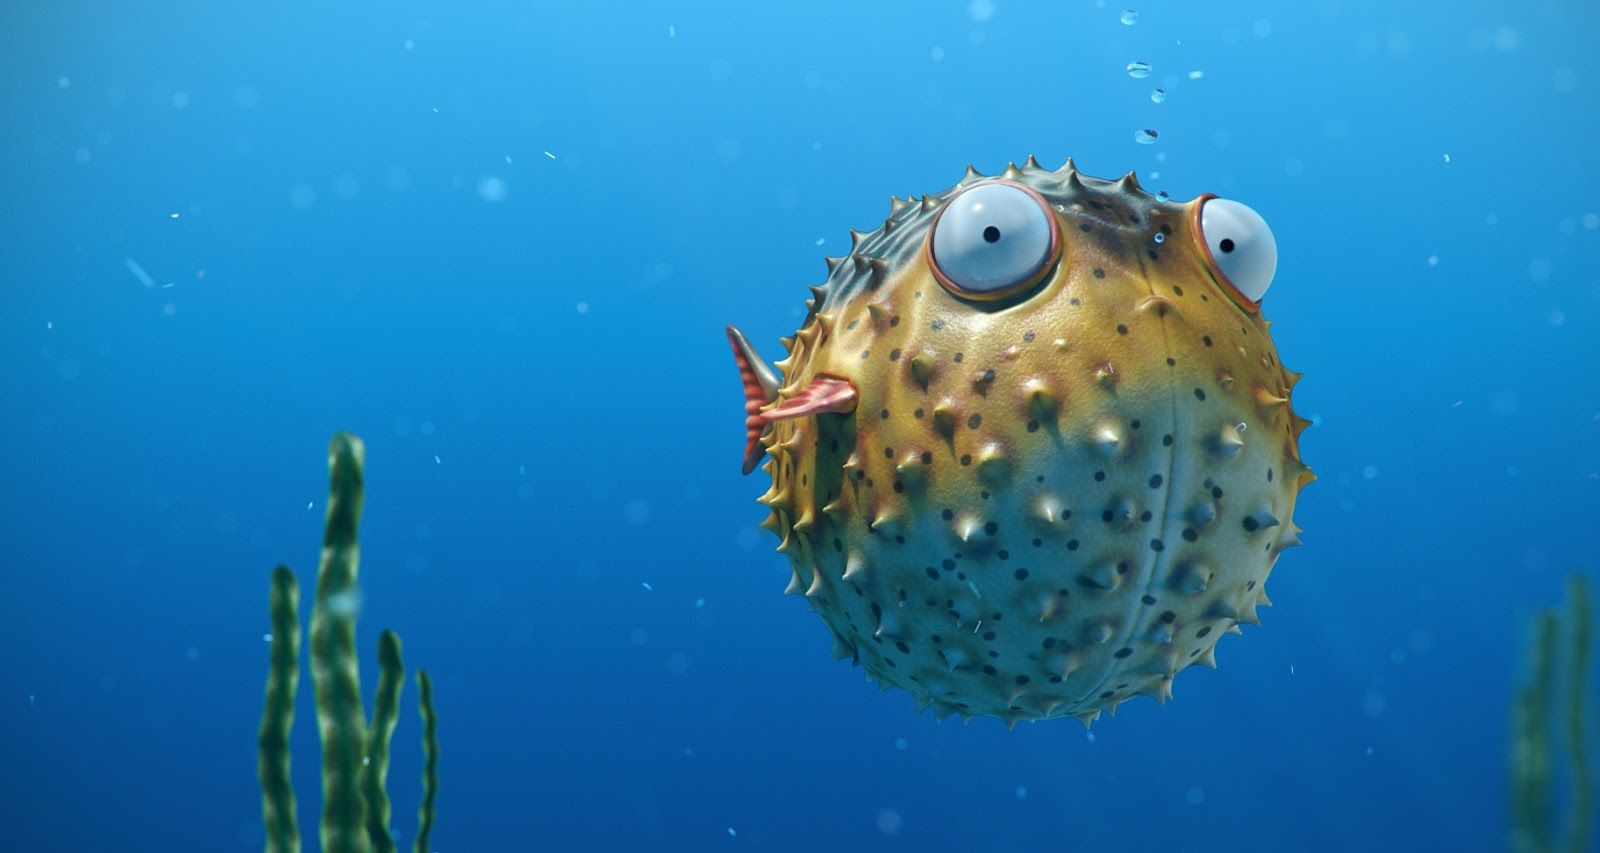 9 Pufferfish Hd Wallpapers Backgrounds Wallpaper Abyss Wallpaper Animals Fish Pet